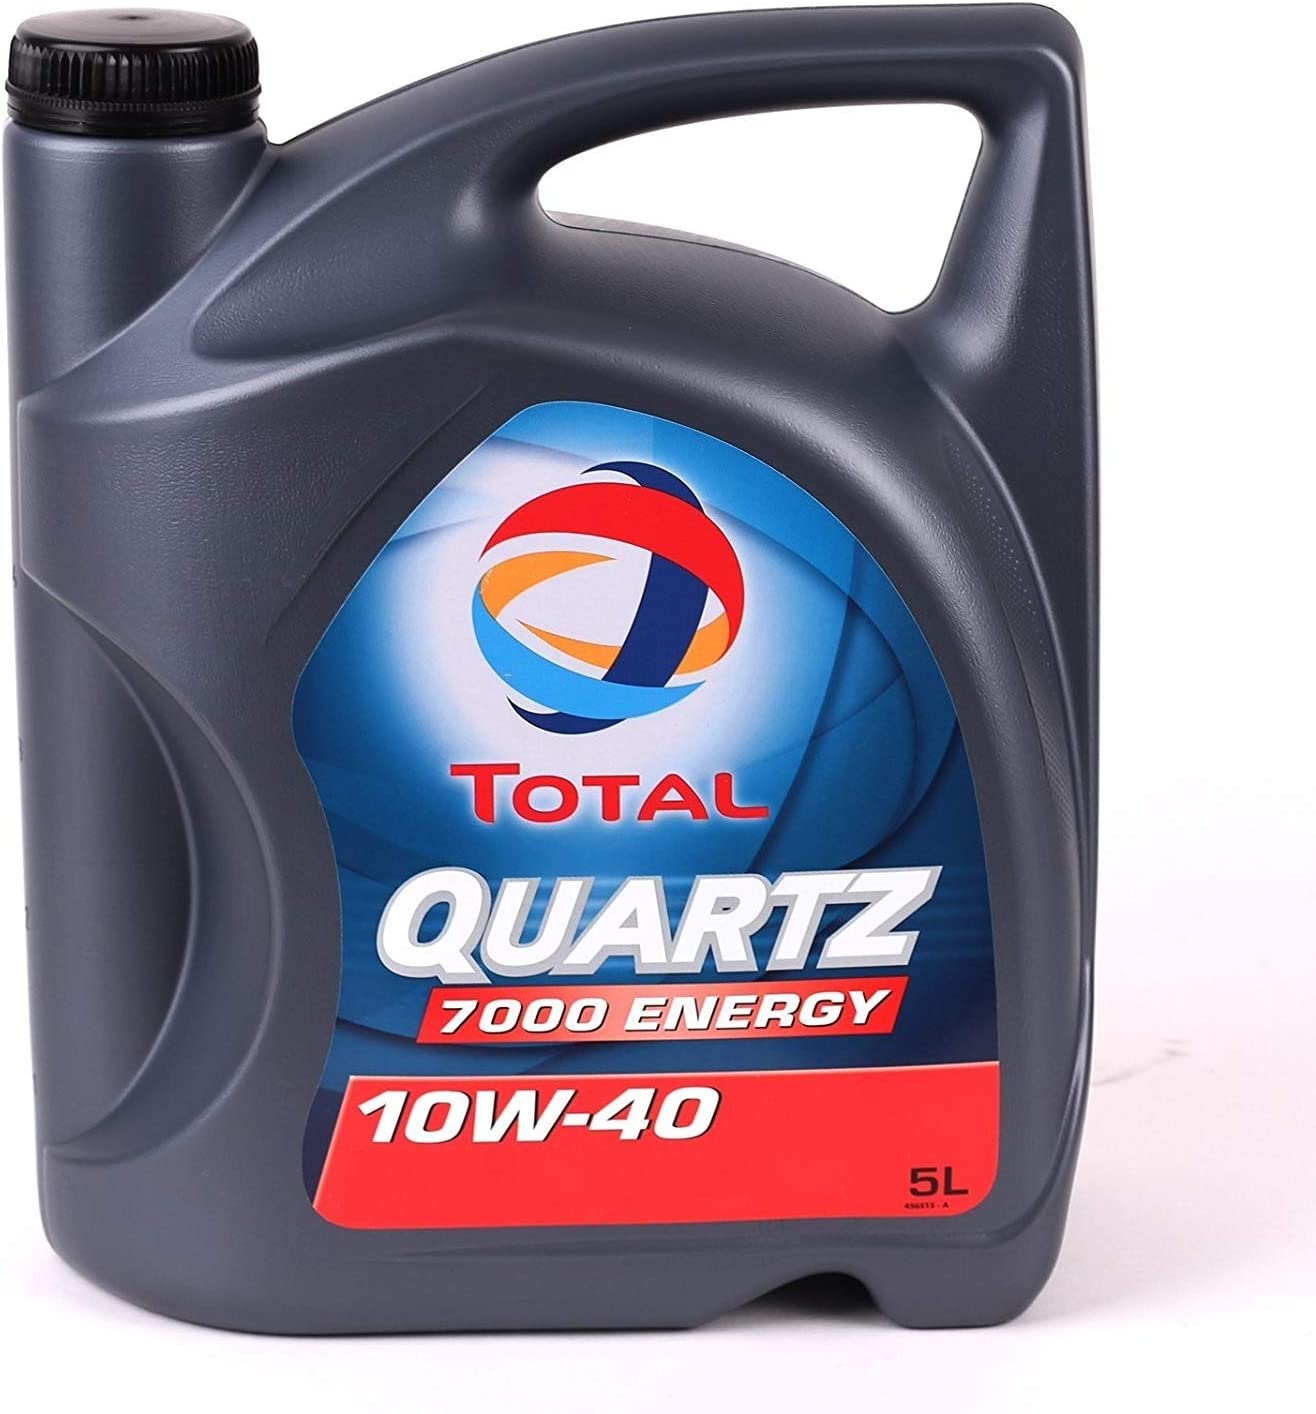 Total 5L Quartz 7000 Energy 10W-40 Aceites de Motor para Coches, 5 ...